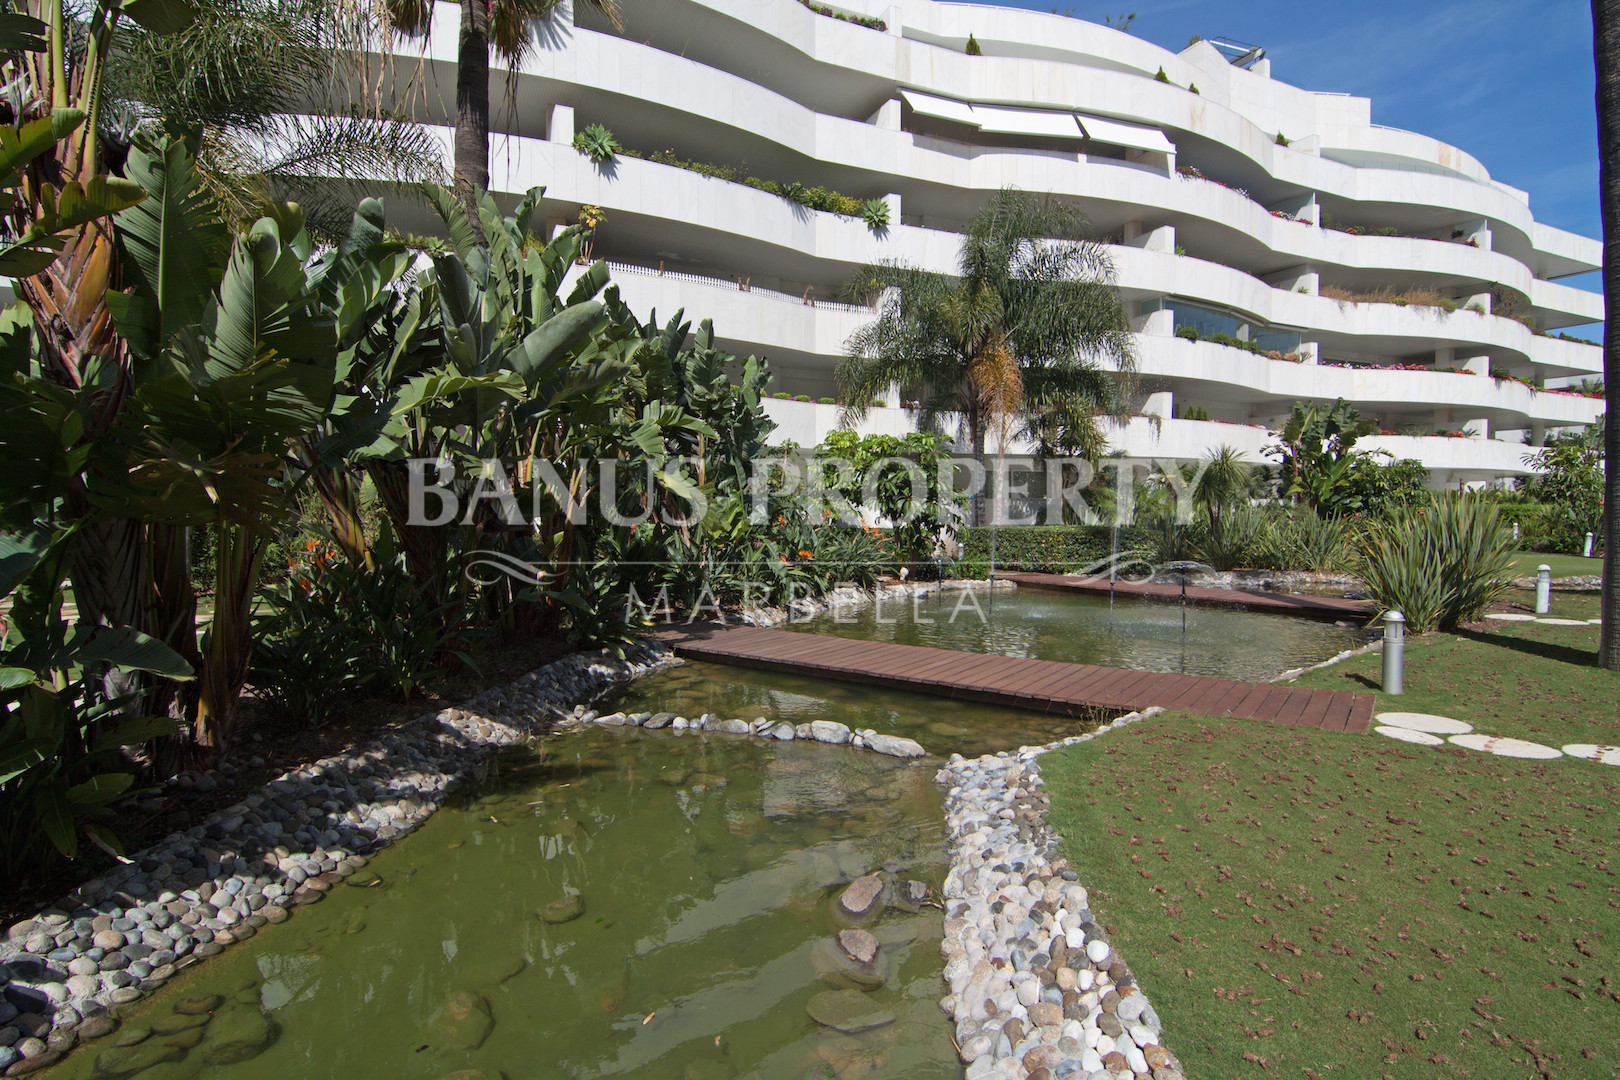 3rd floor 2 bedroom luxury apartment for sale in El Embrujo Banus